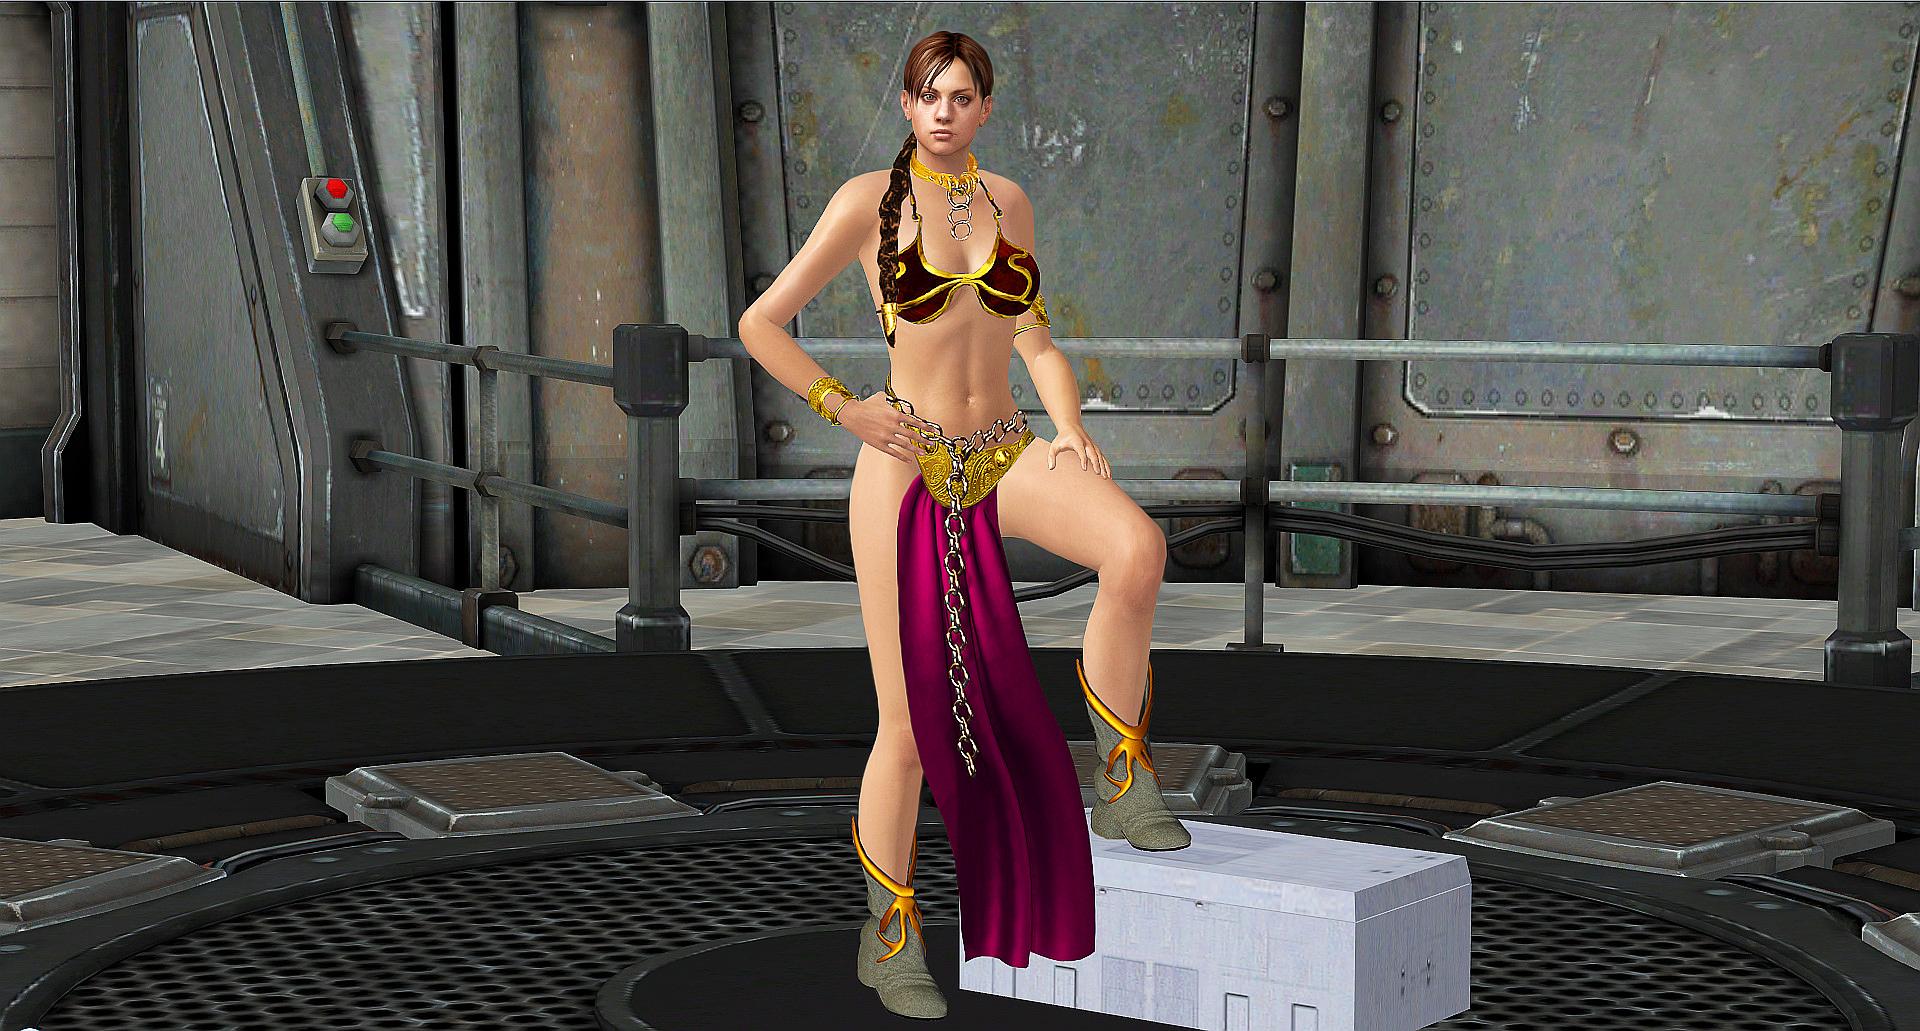 Jill SLAVE-LEIA POSE By Blw7920 On DeviantArt